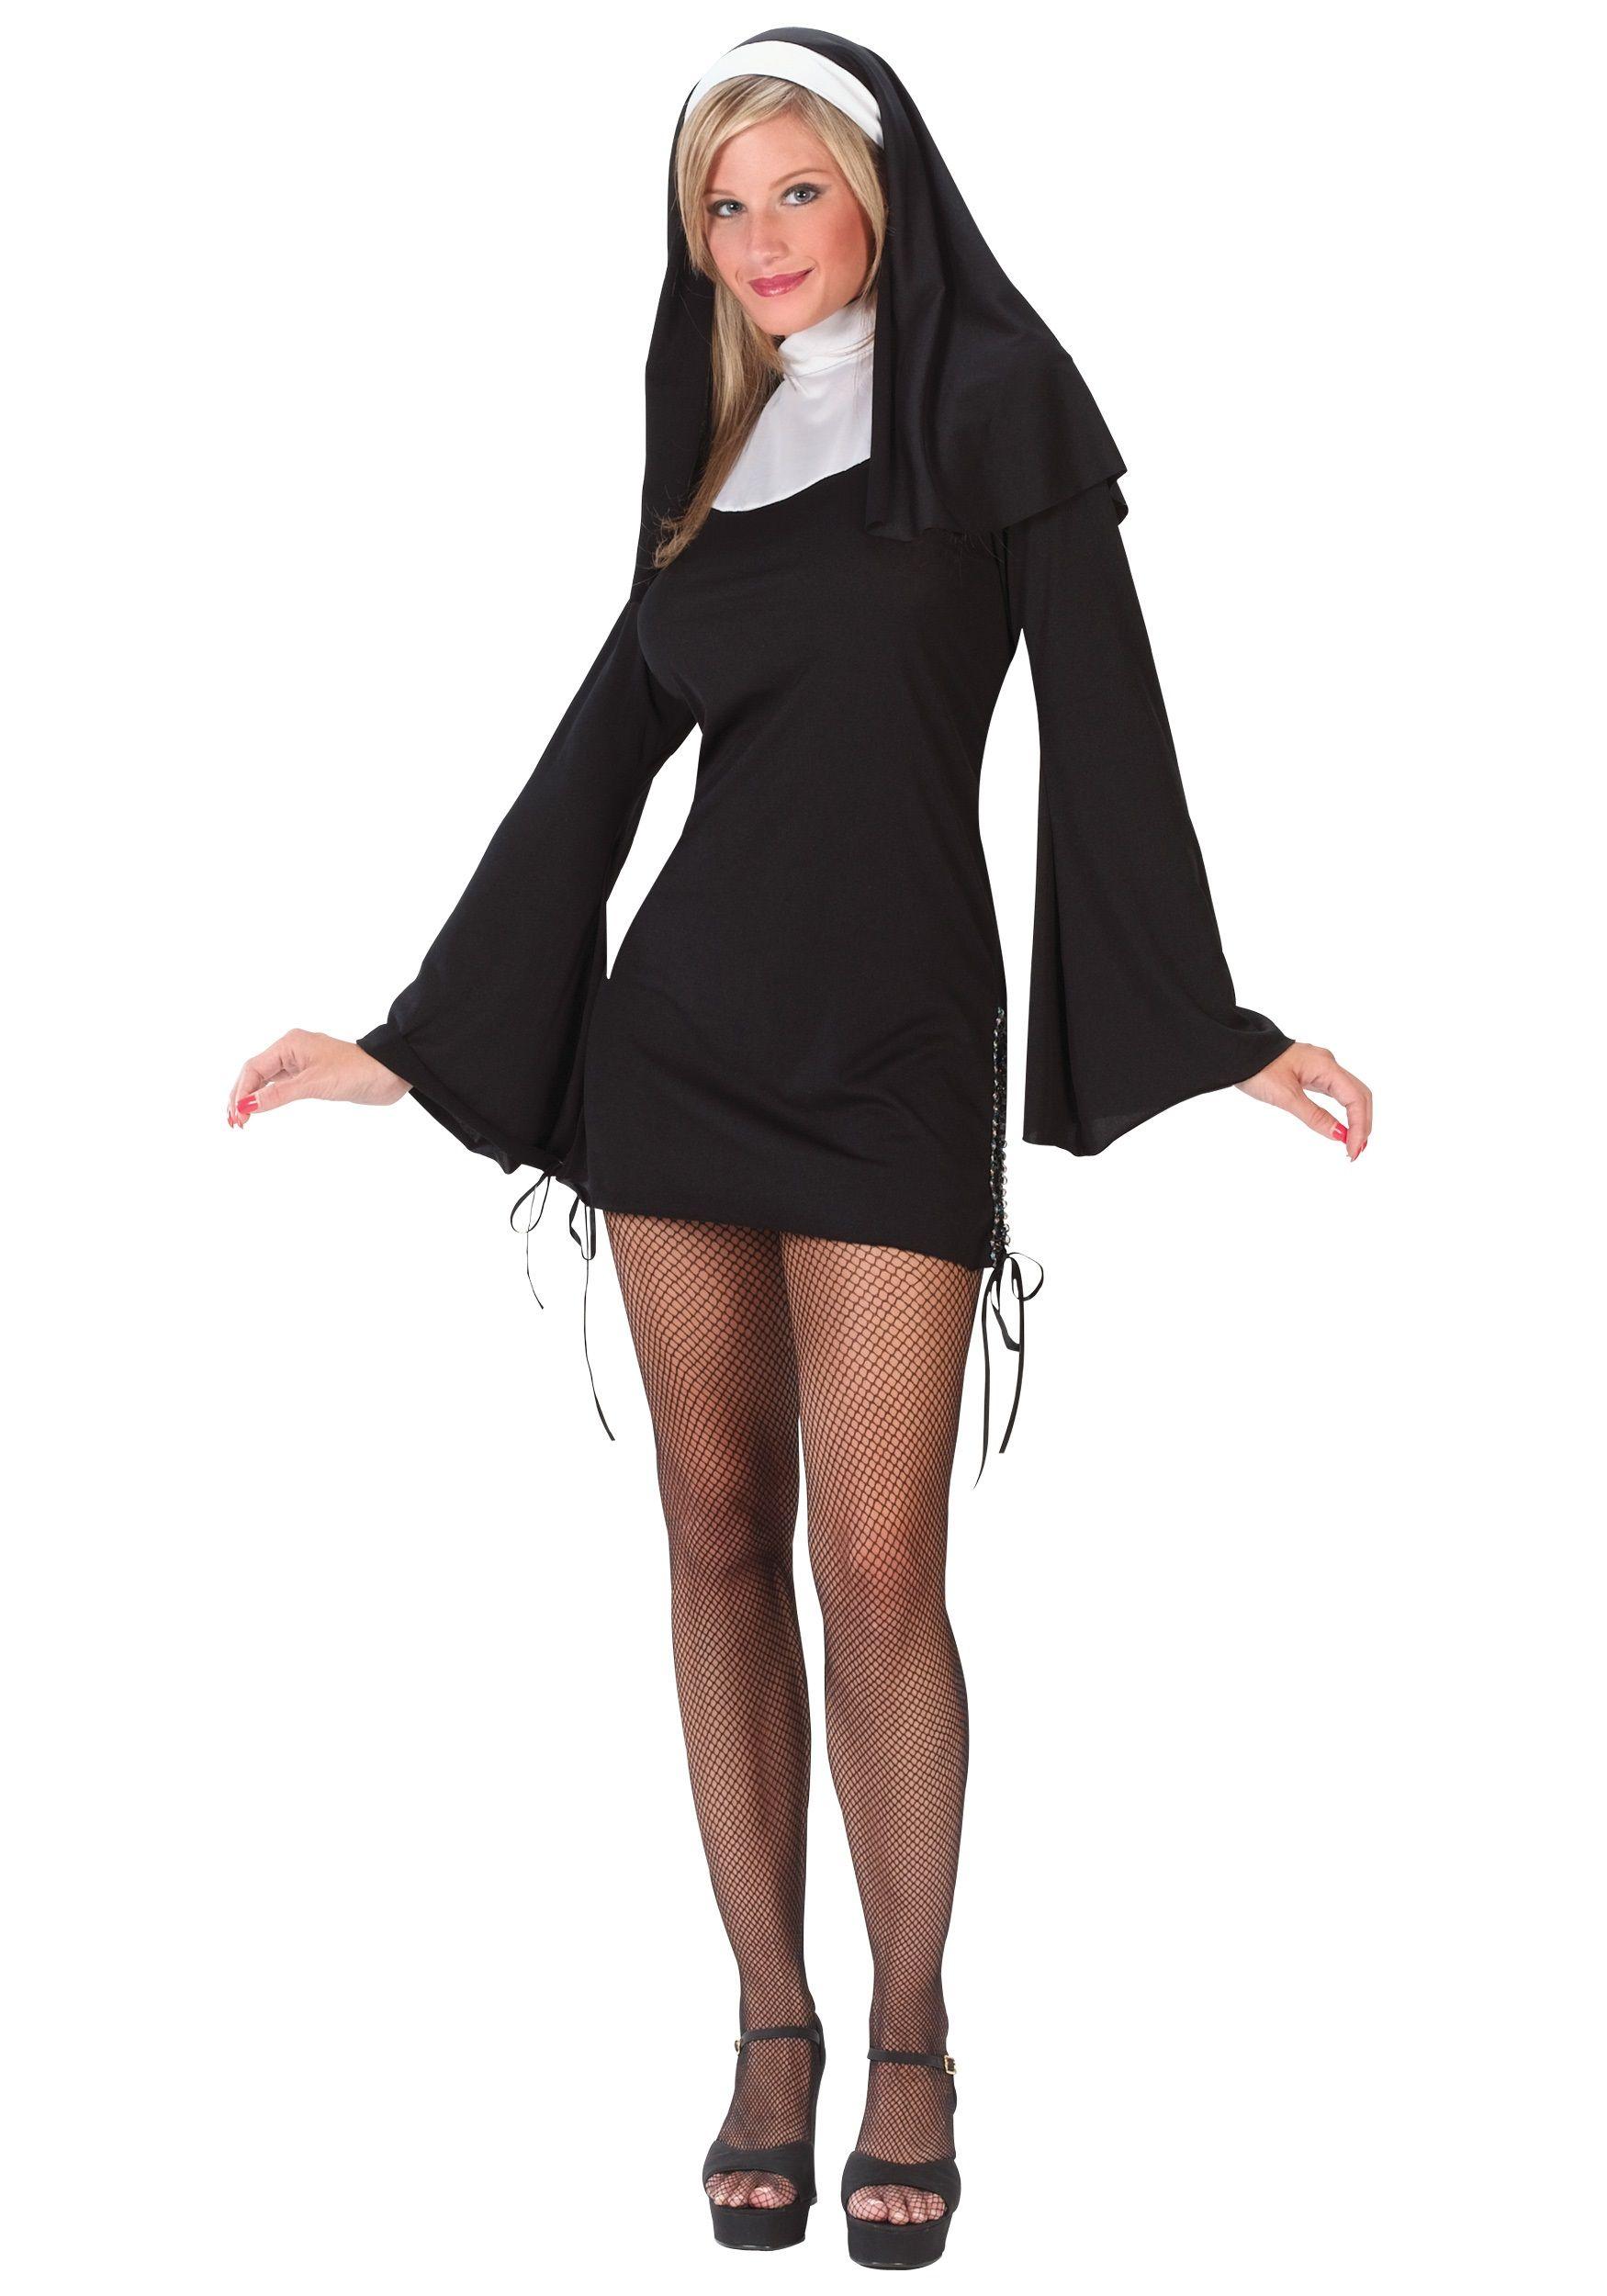 b6ab7223c53 sexy nun costume   female   Halloween costumes, Costumes, Nun costume